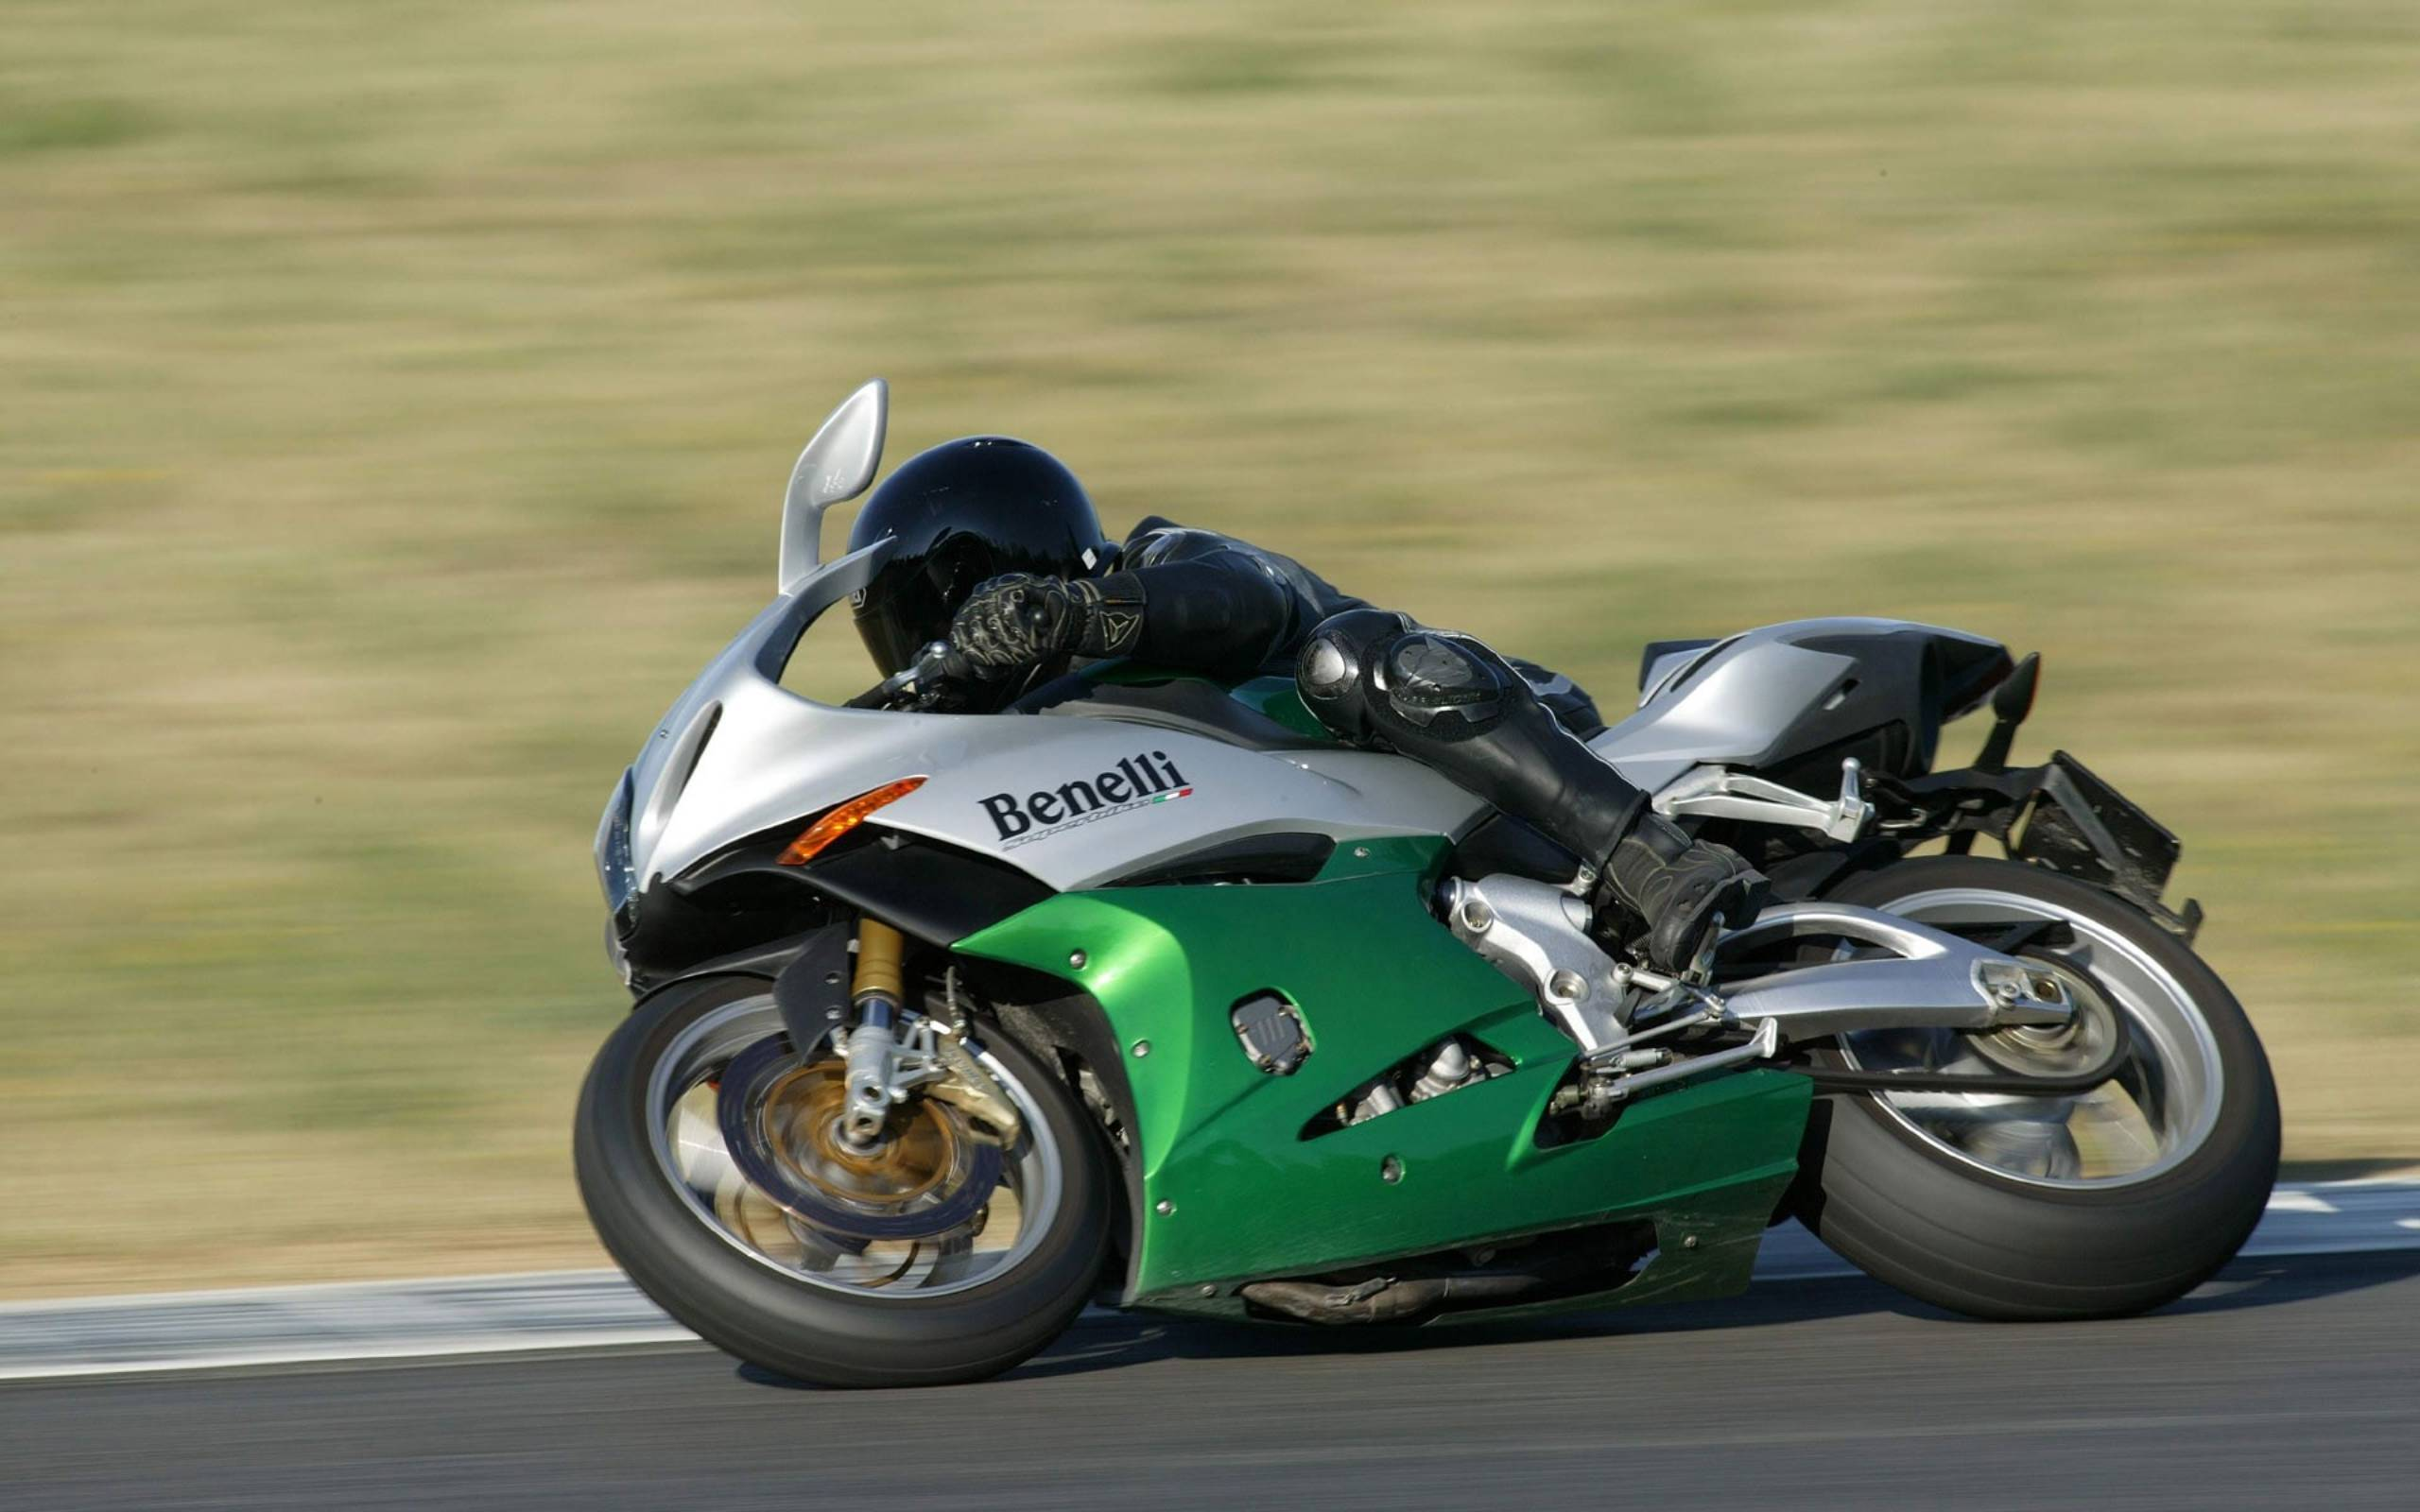 Обои спортивный мотоцикл, Benelli, скорость, поворот